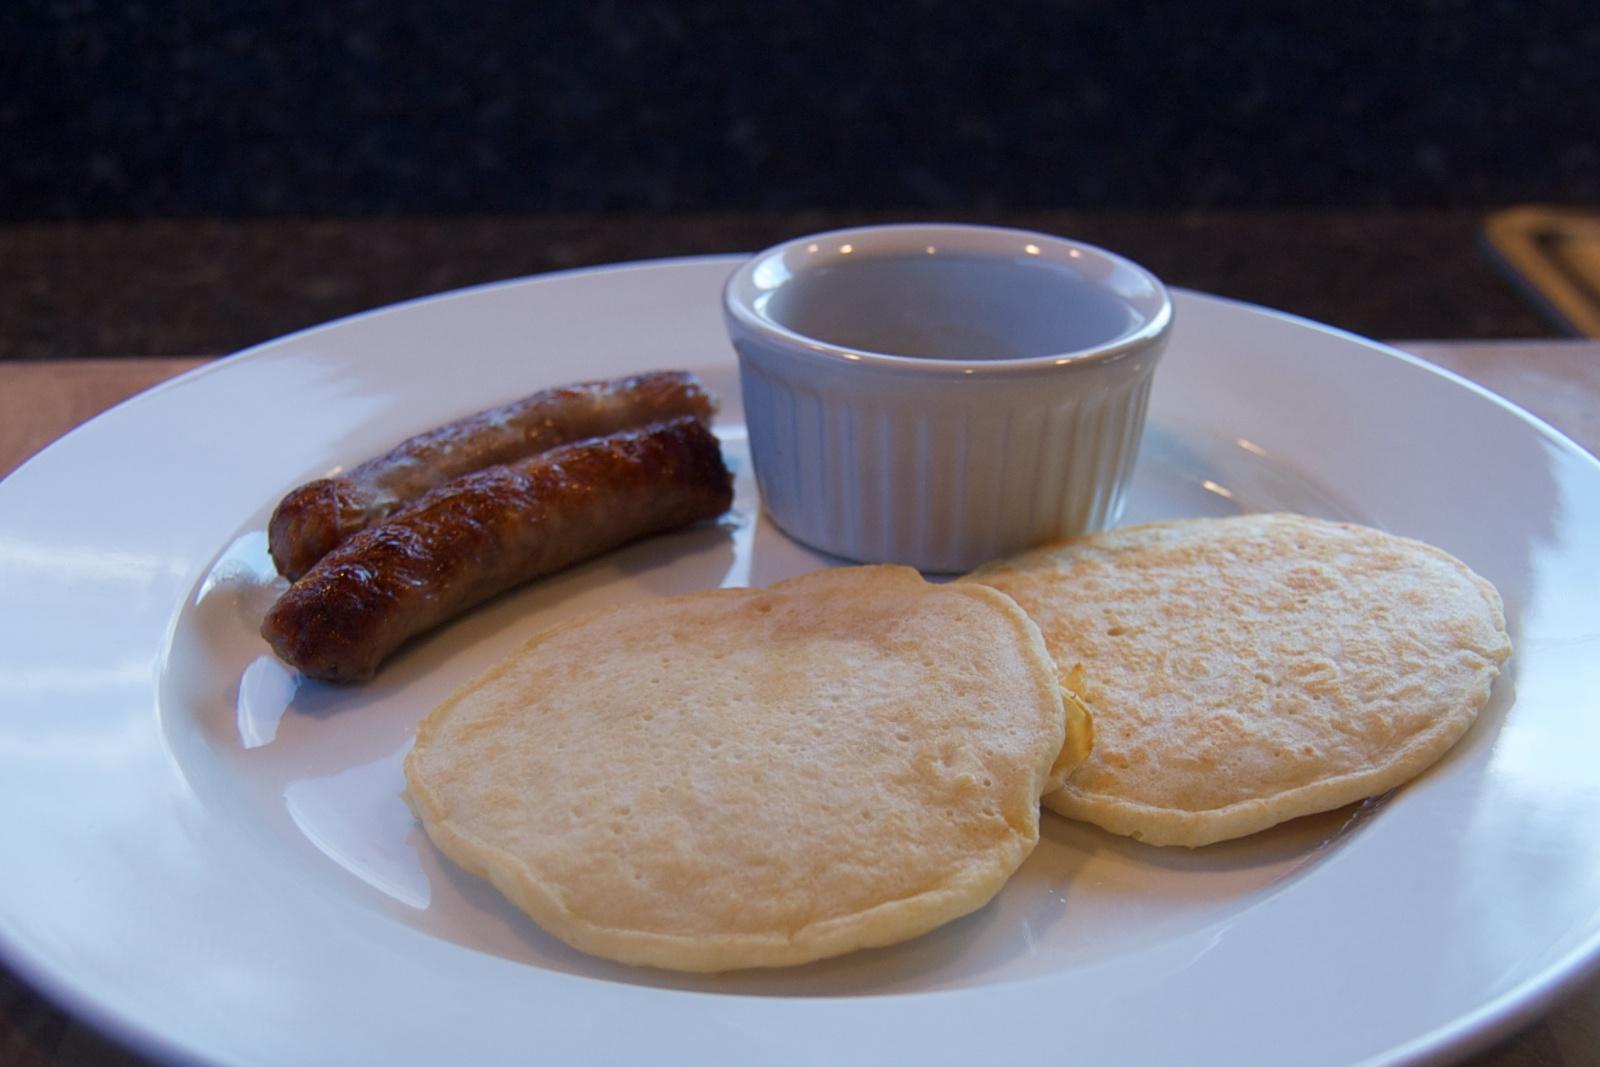 http://blog.rickk.com/food/2011/11/03/ate.2011.11.03.b.jpg